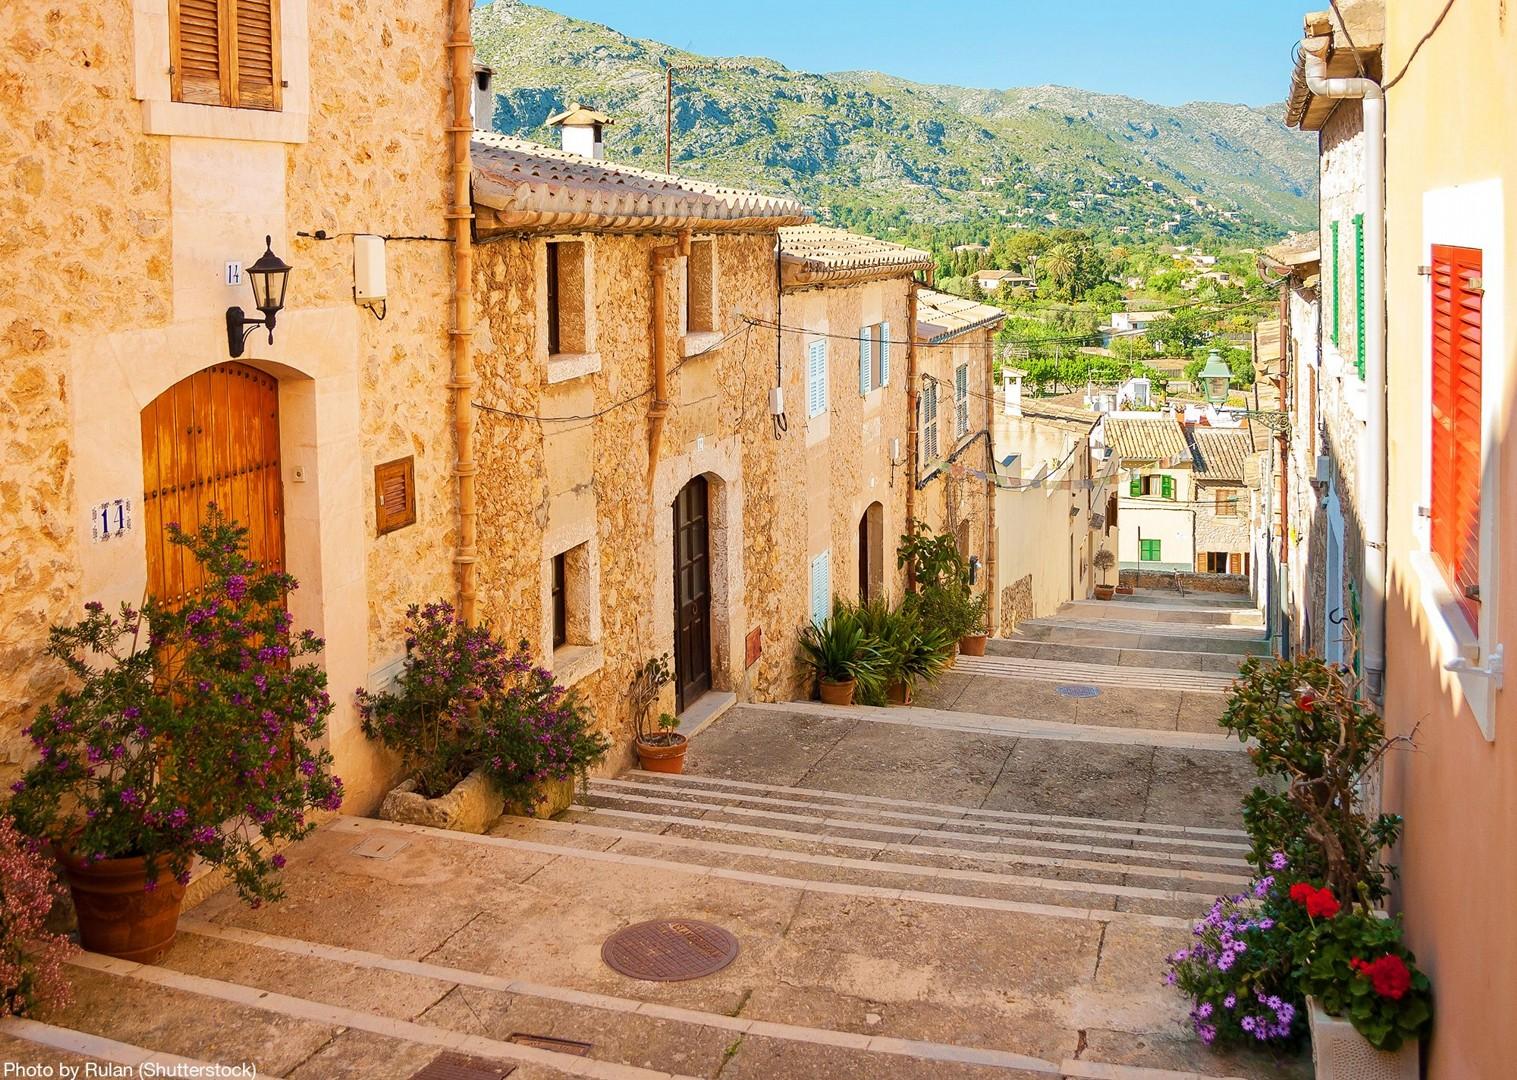 eu-centro-pollenca-mallorca-explore-local-streets-bike-tour.jpg - Spain - Mallorca - Self-Guided Leisure Cycling Holiday - Leisure Cycling